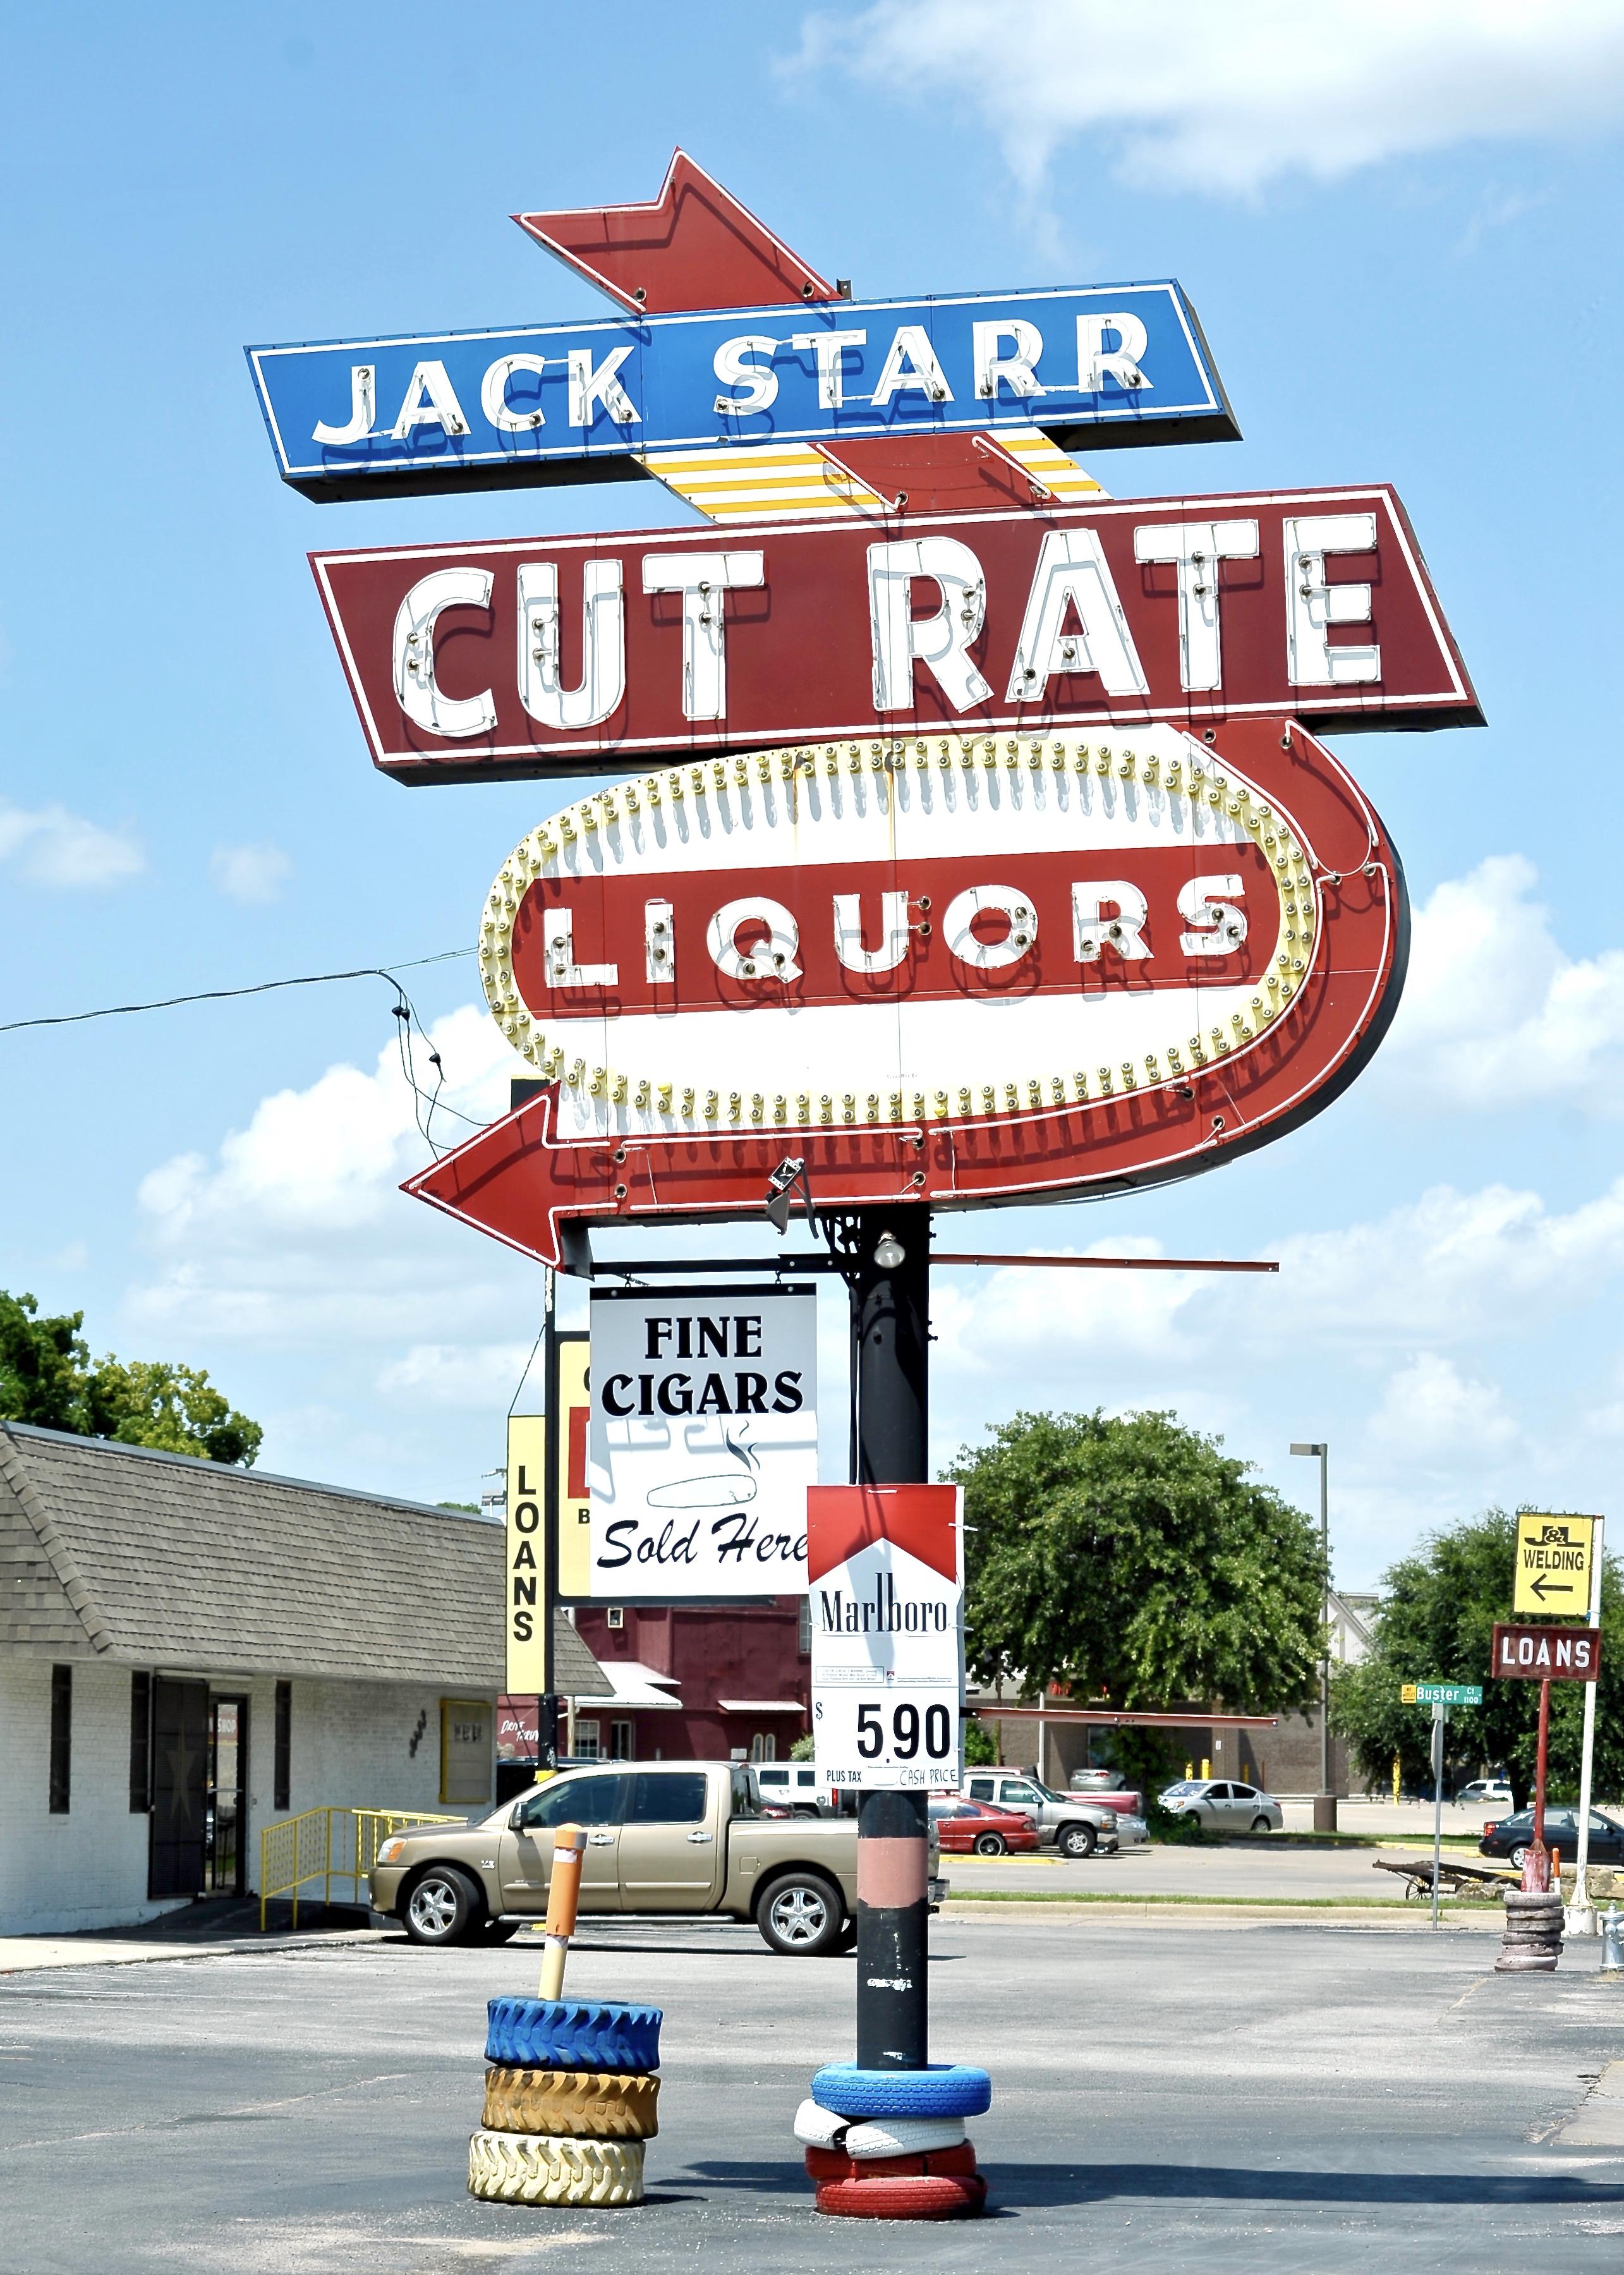 Jack Starr Cut Rate Liquors - 3725 East Belknap Street, Fort Worth, Texas U.S.A. - June 22, 2016